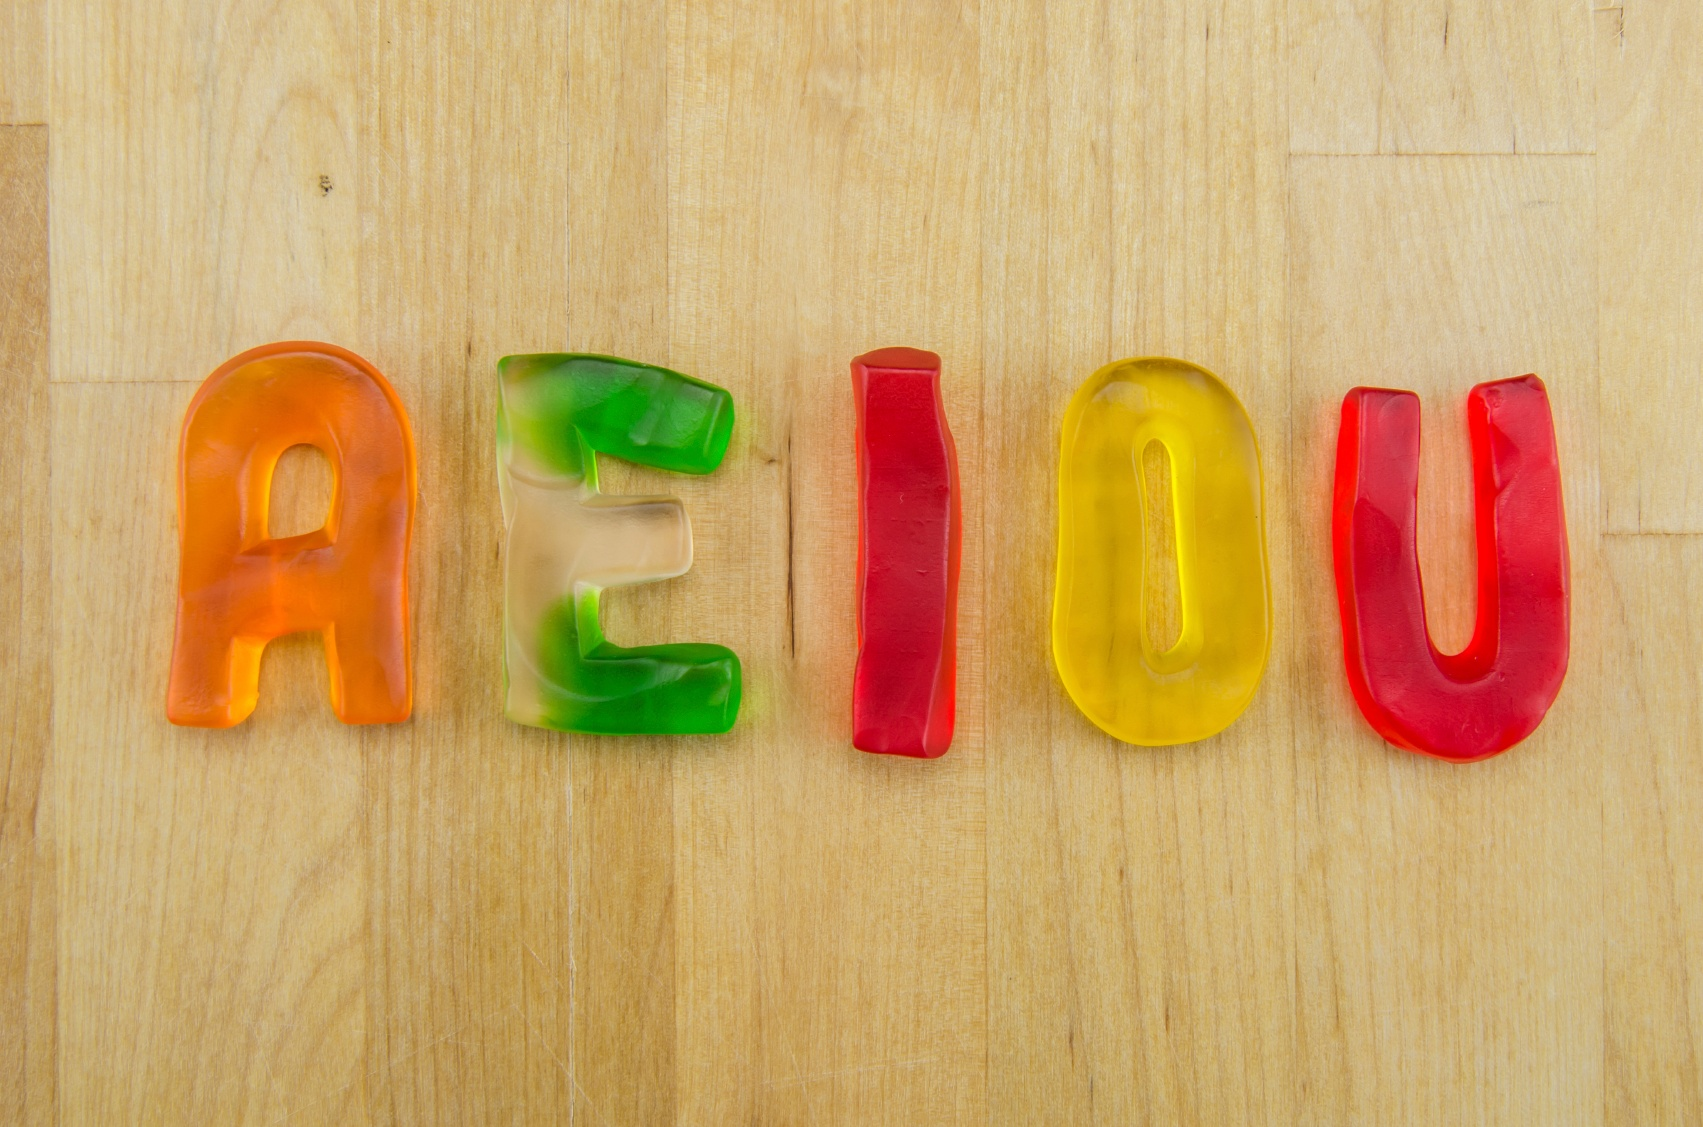 Vowels-a-e-i-o-u-colorful-gummy-candies